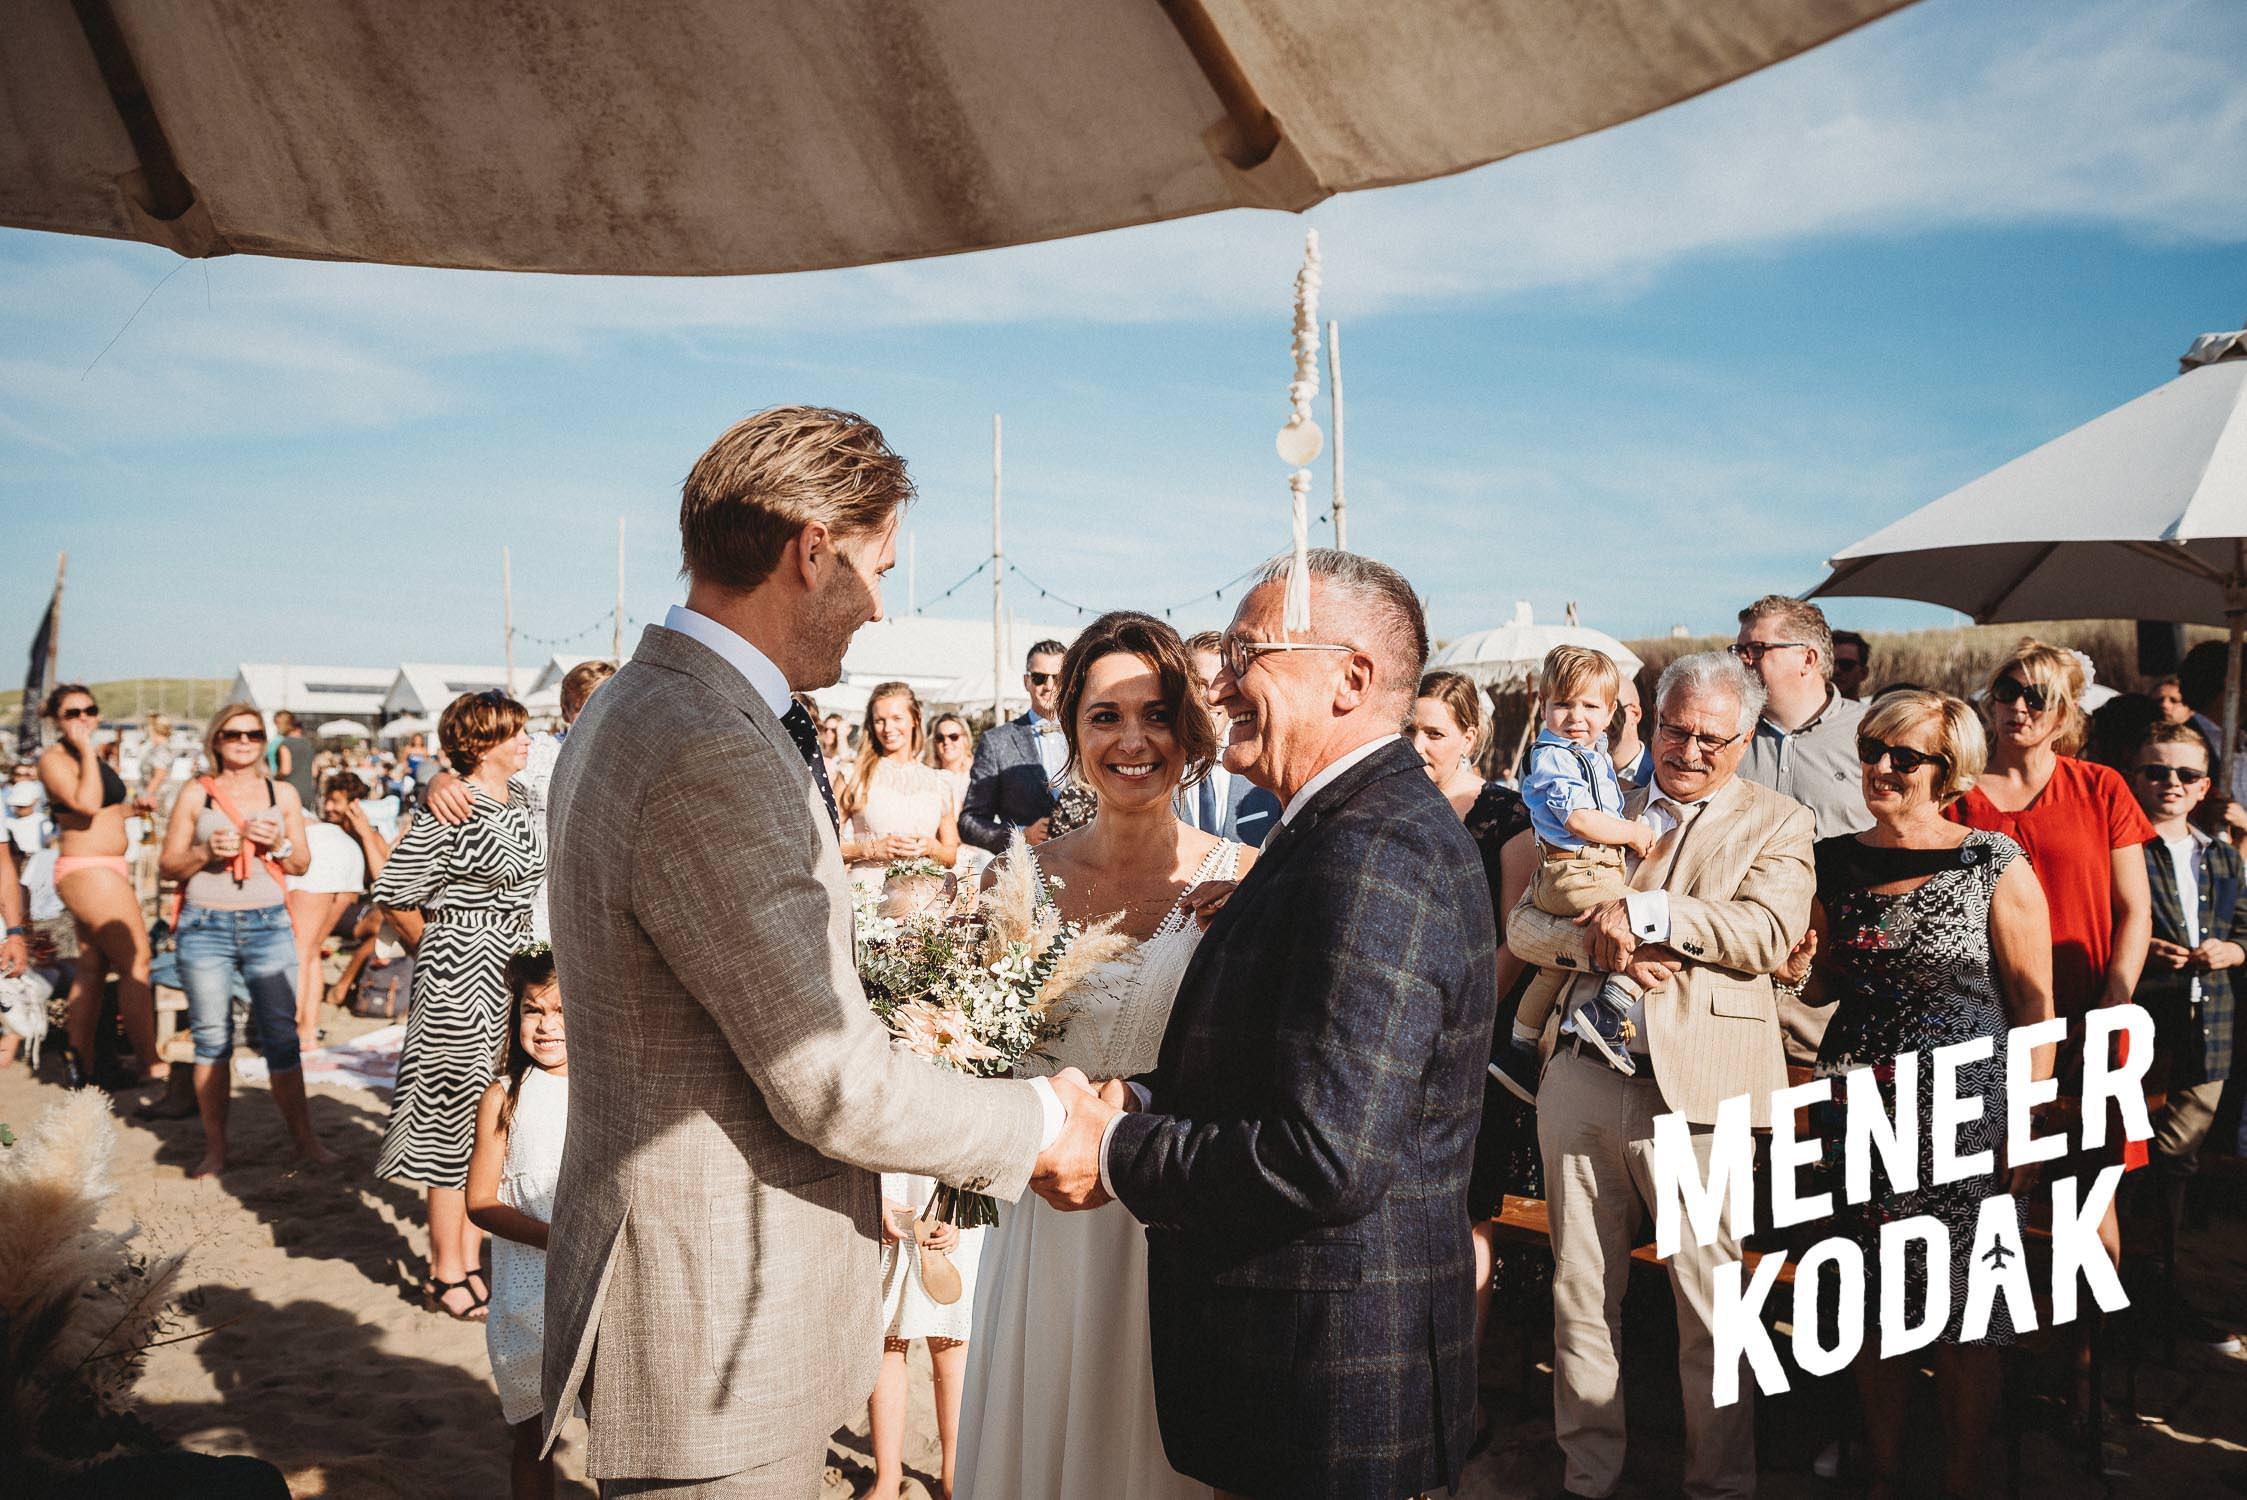 Meneer Kodak - Strandbruiloft - Noordwijk - K&A-082.jpg